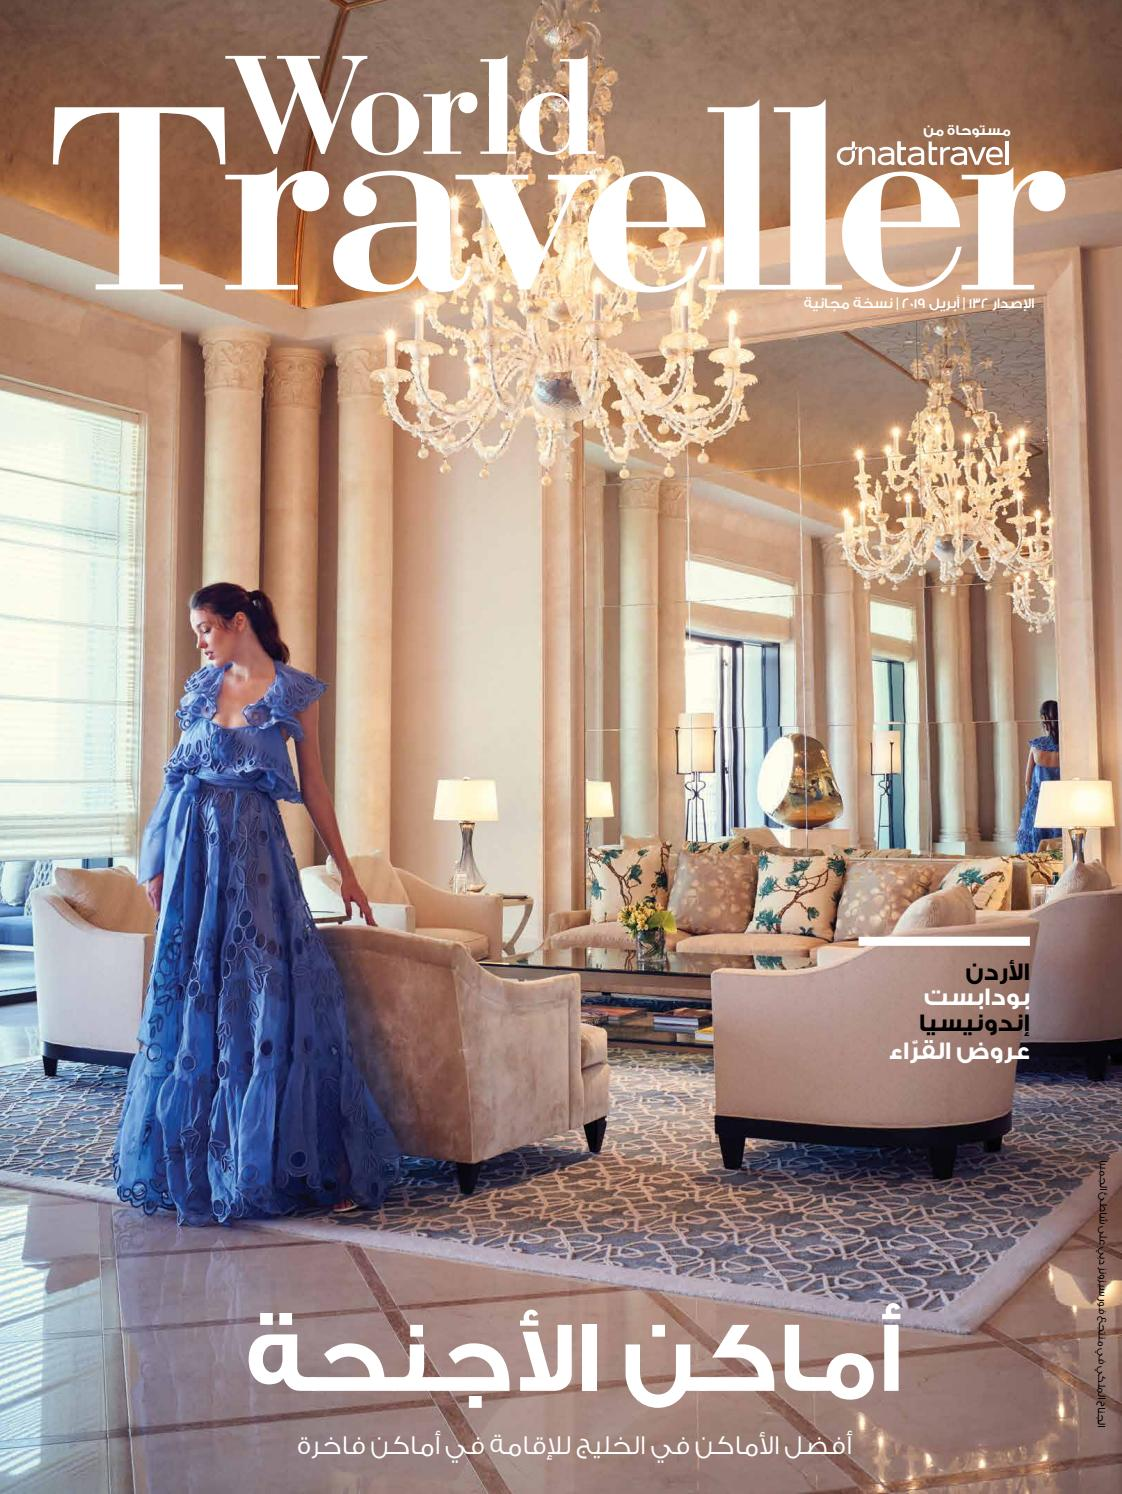 c5433c45a6d2f World Traveller - ARABIC - April 19 by Hot Media - issuu